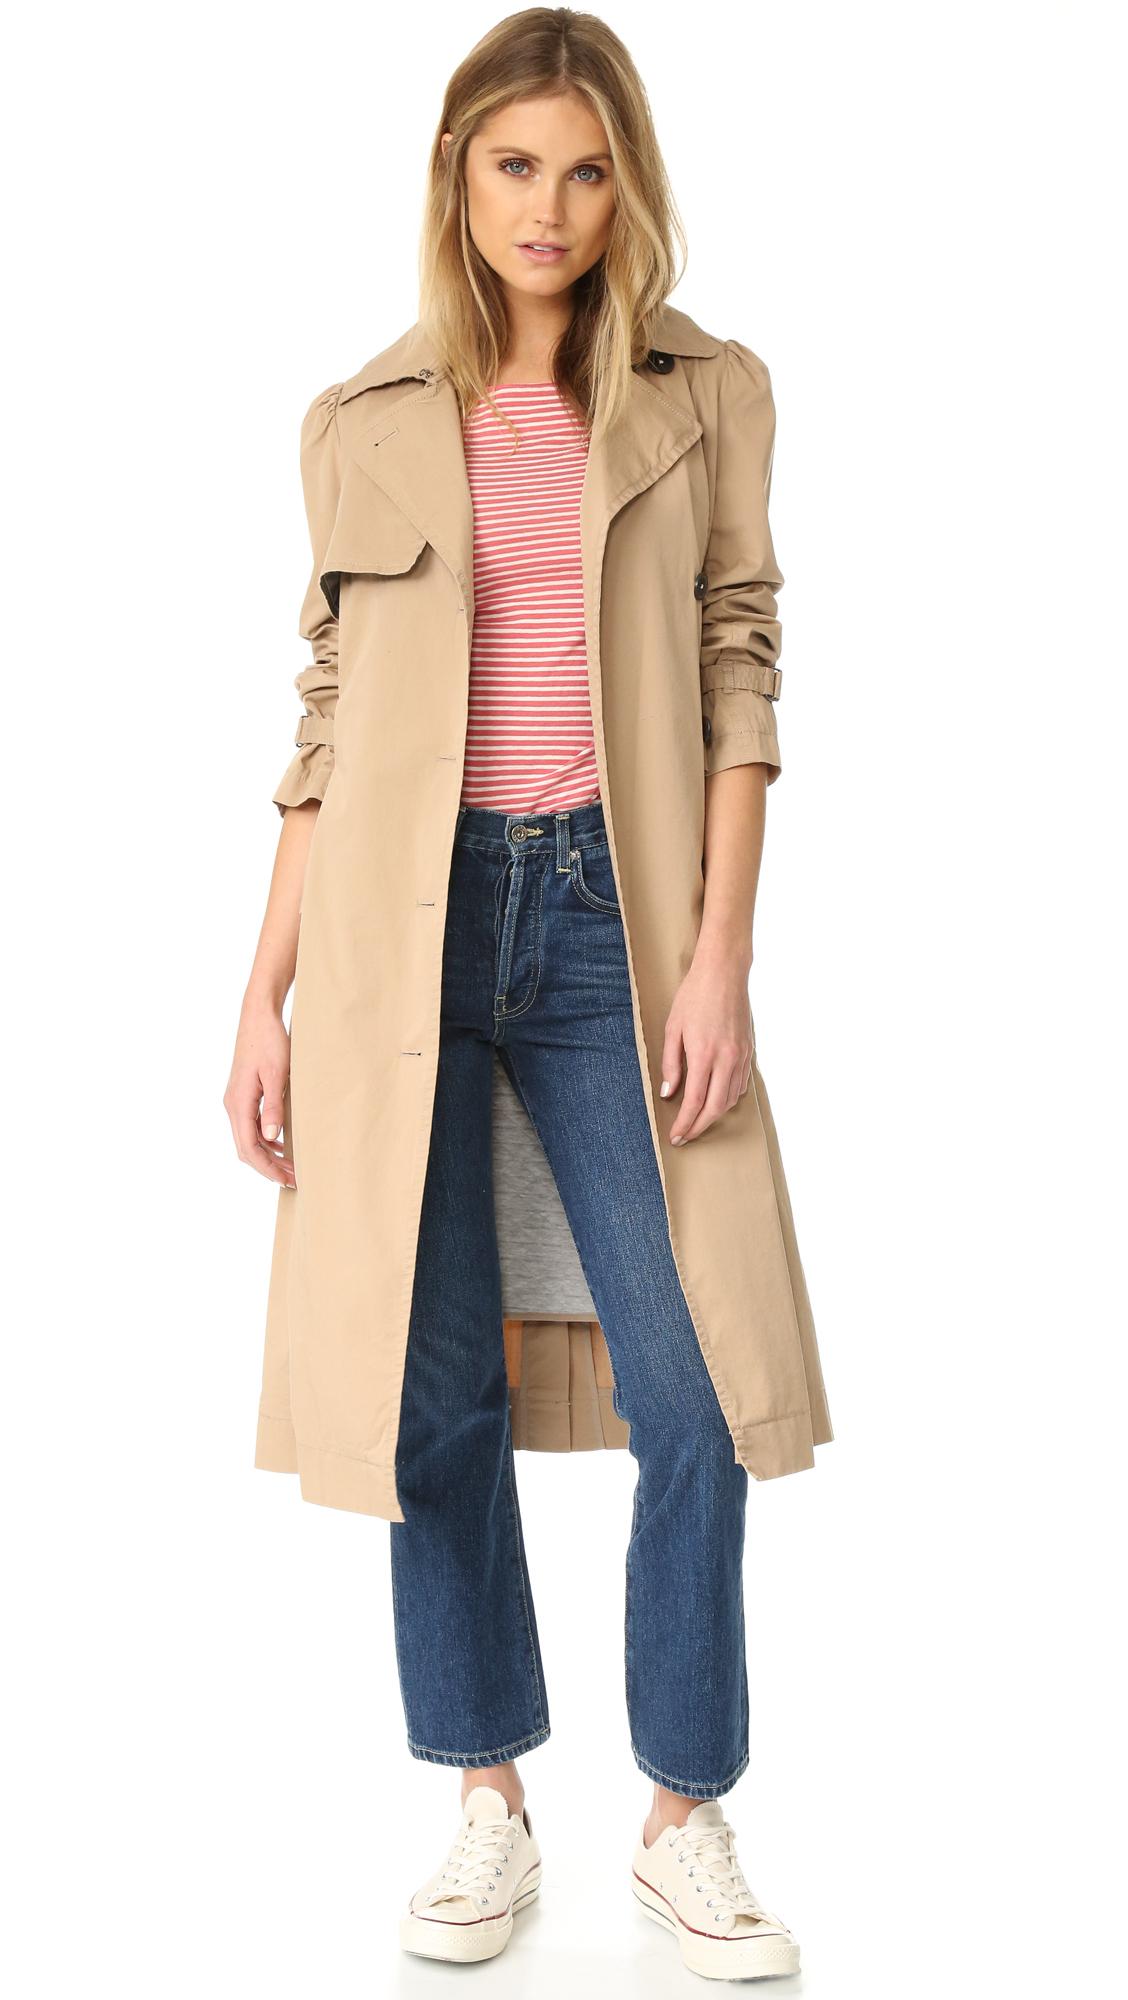 La Vie Rebecca Taylor Twill Trench Coat - Tawny at Shopbop